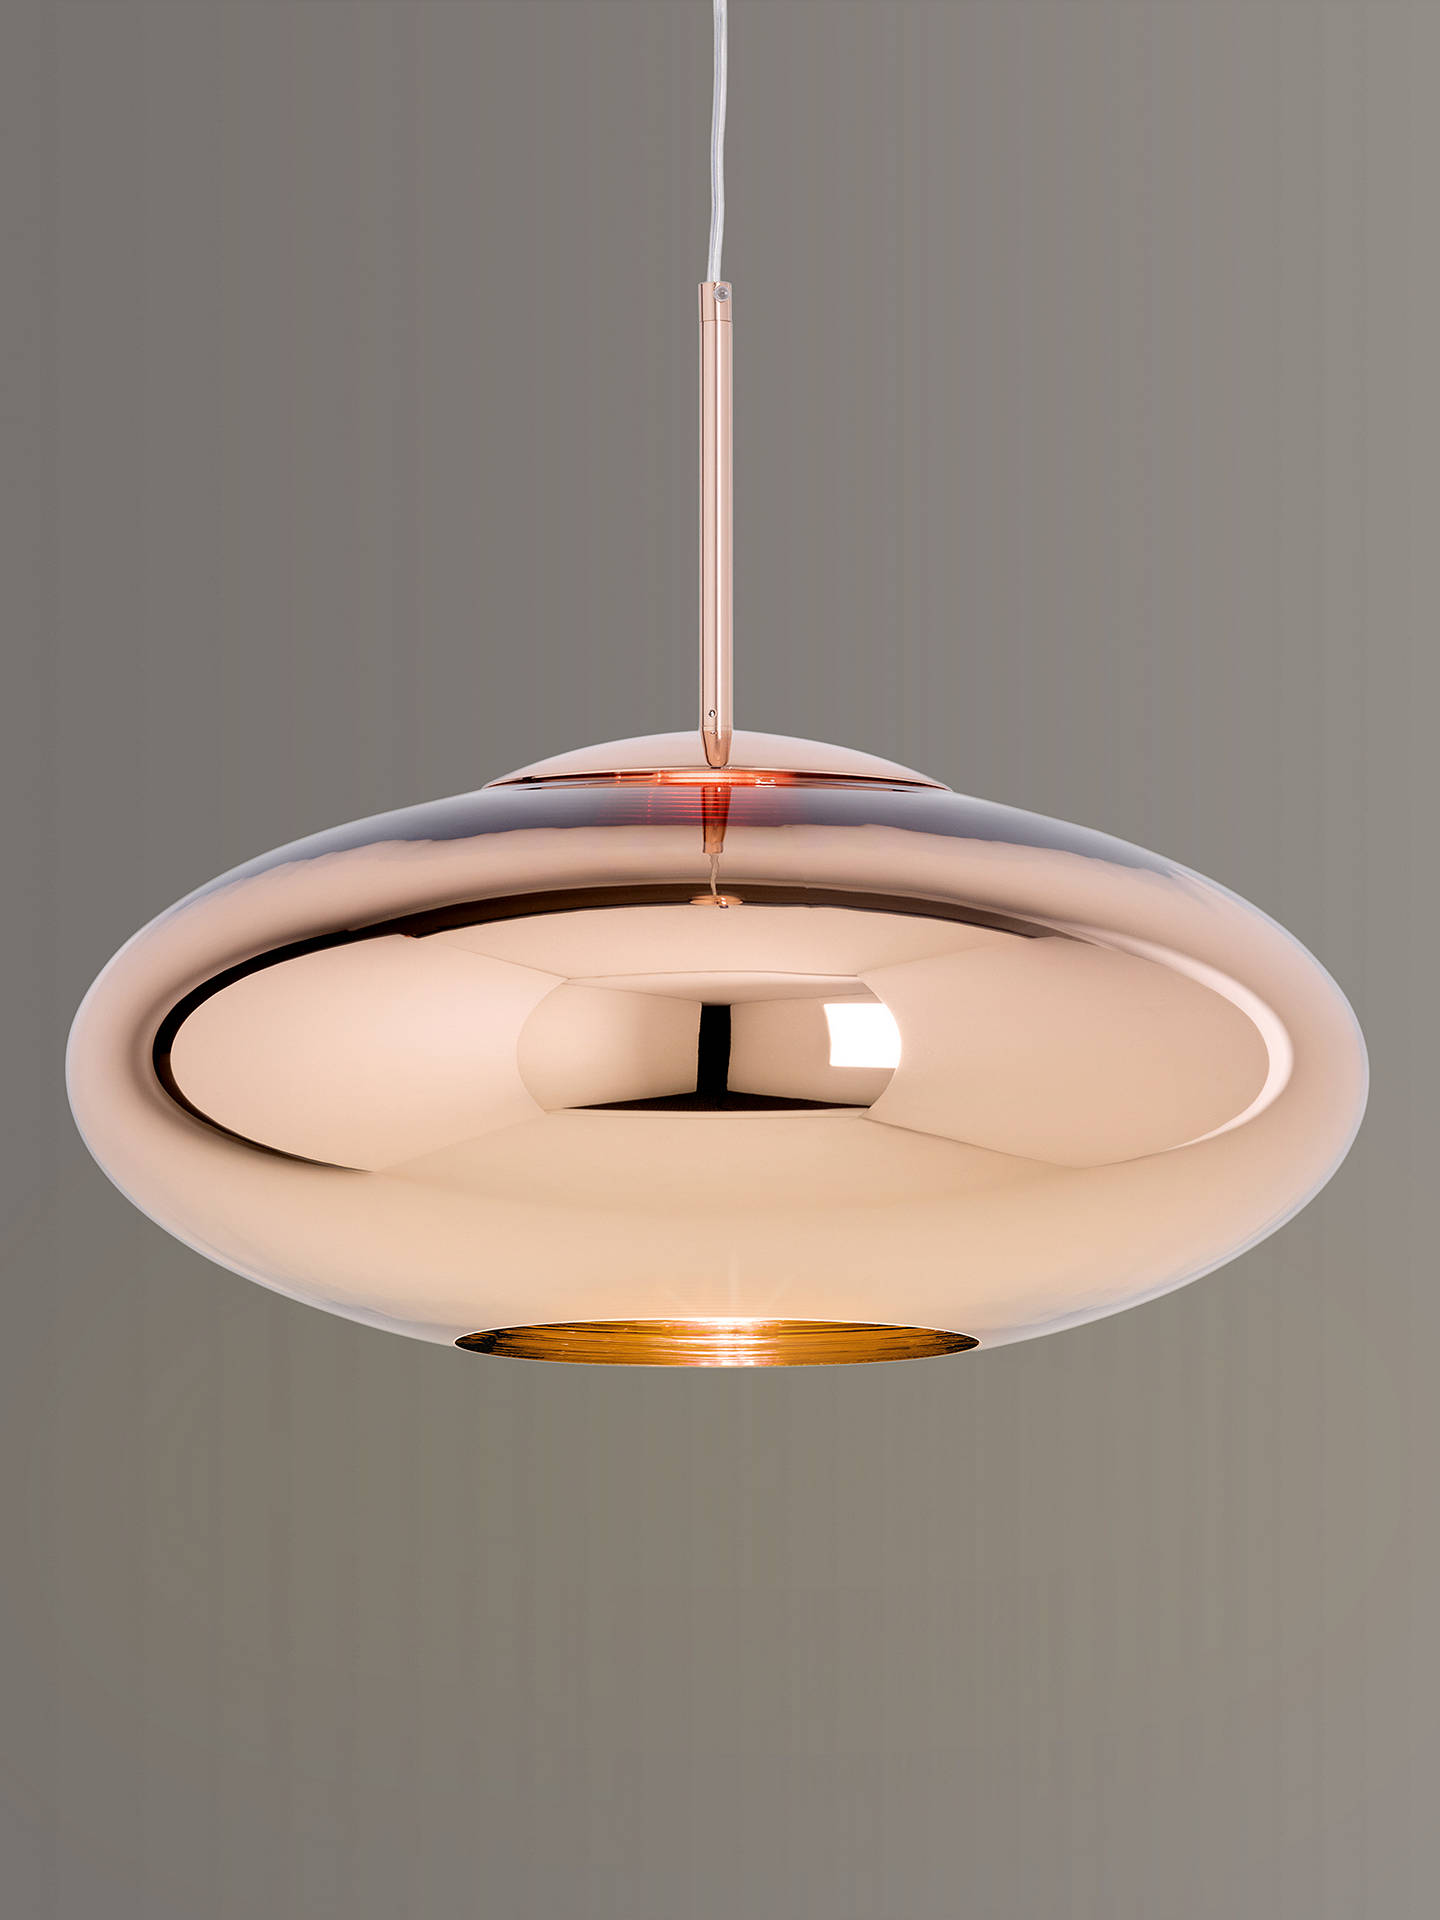 best loved f187f 1945b Tom Dixon Copper Wide Pendant Ceiling Light, 50cm